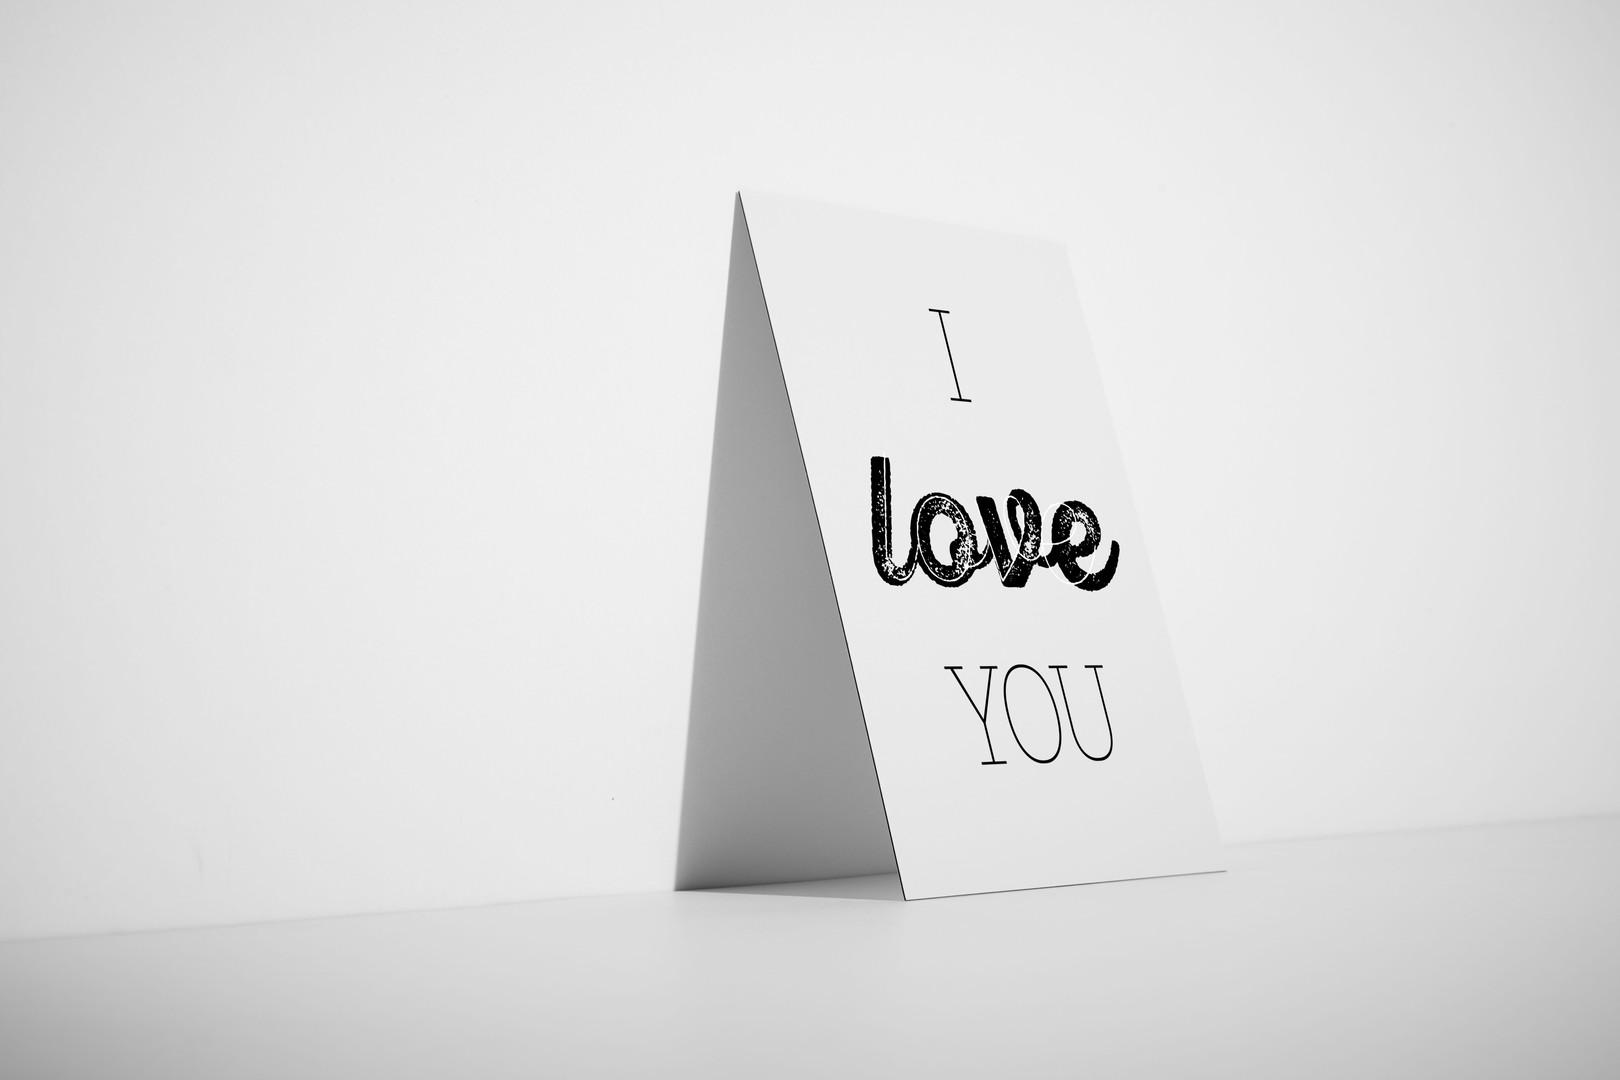 kleoncards_wall_i_love_you.jpg